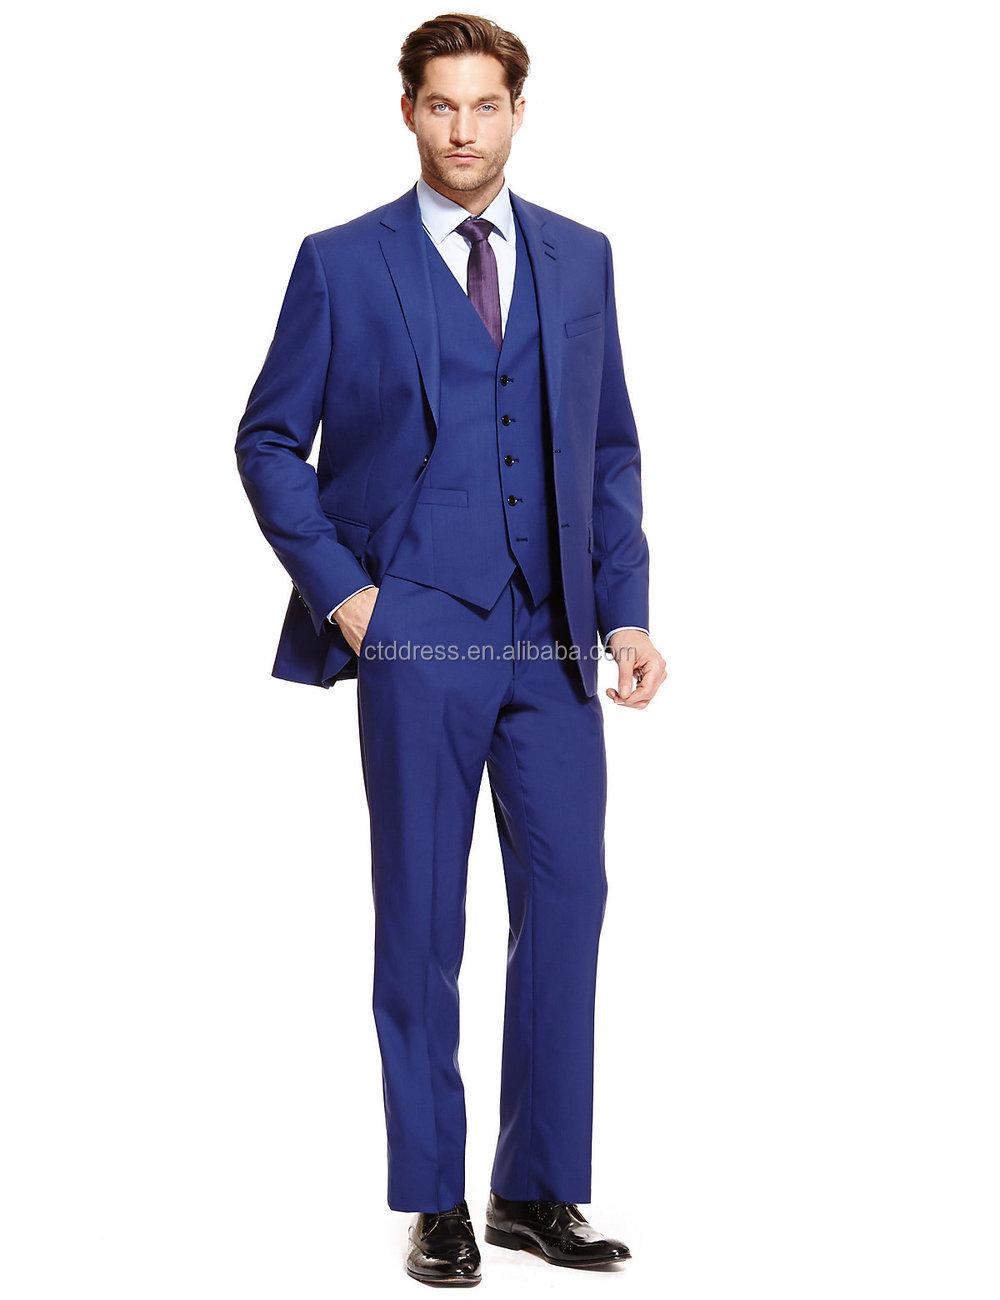 2015 New Arriving High End 100% Wool Royal Blue Men Three Piece ...